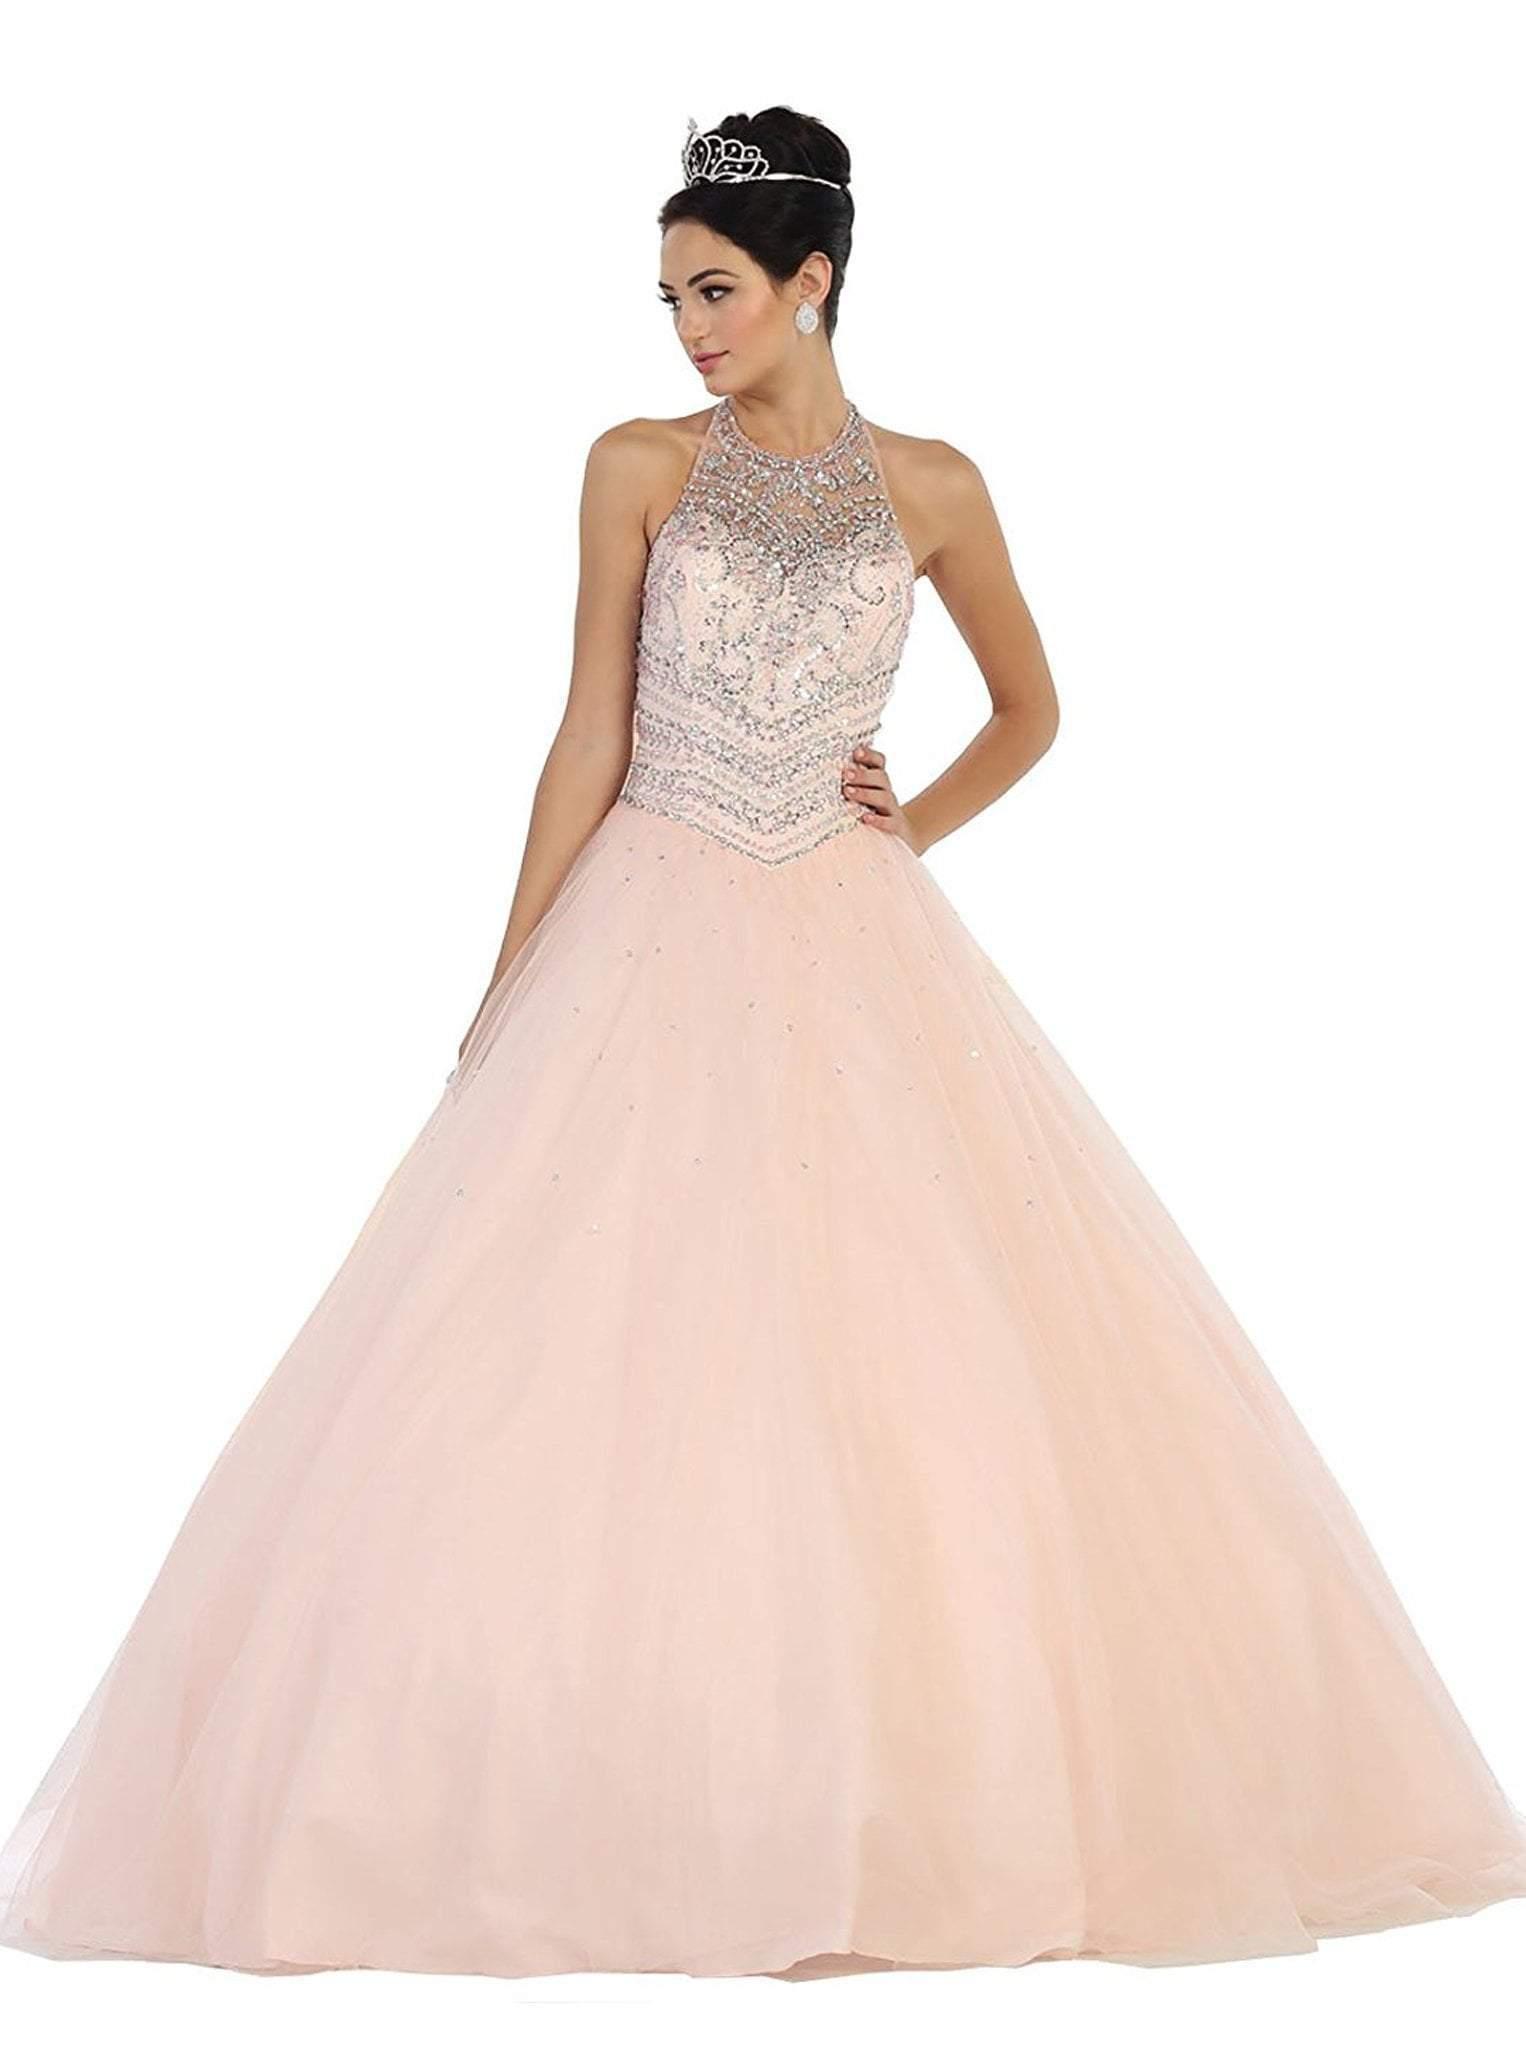 May Queen - LK79 Jewel-Encrusted Halter Neck Ball Gown